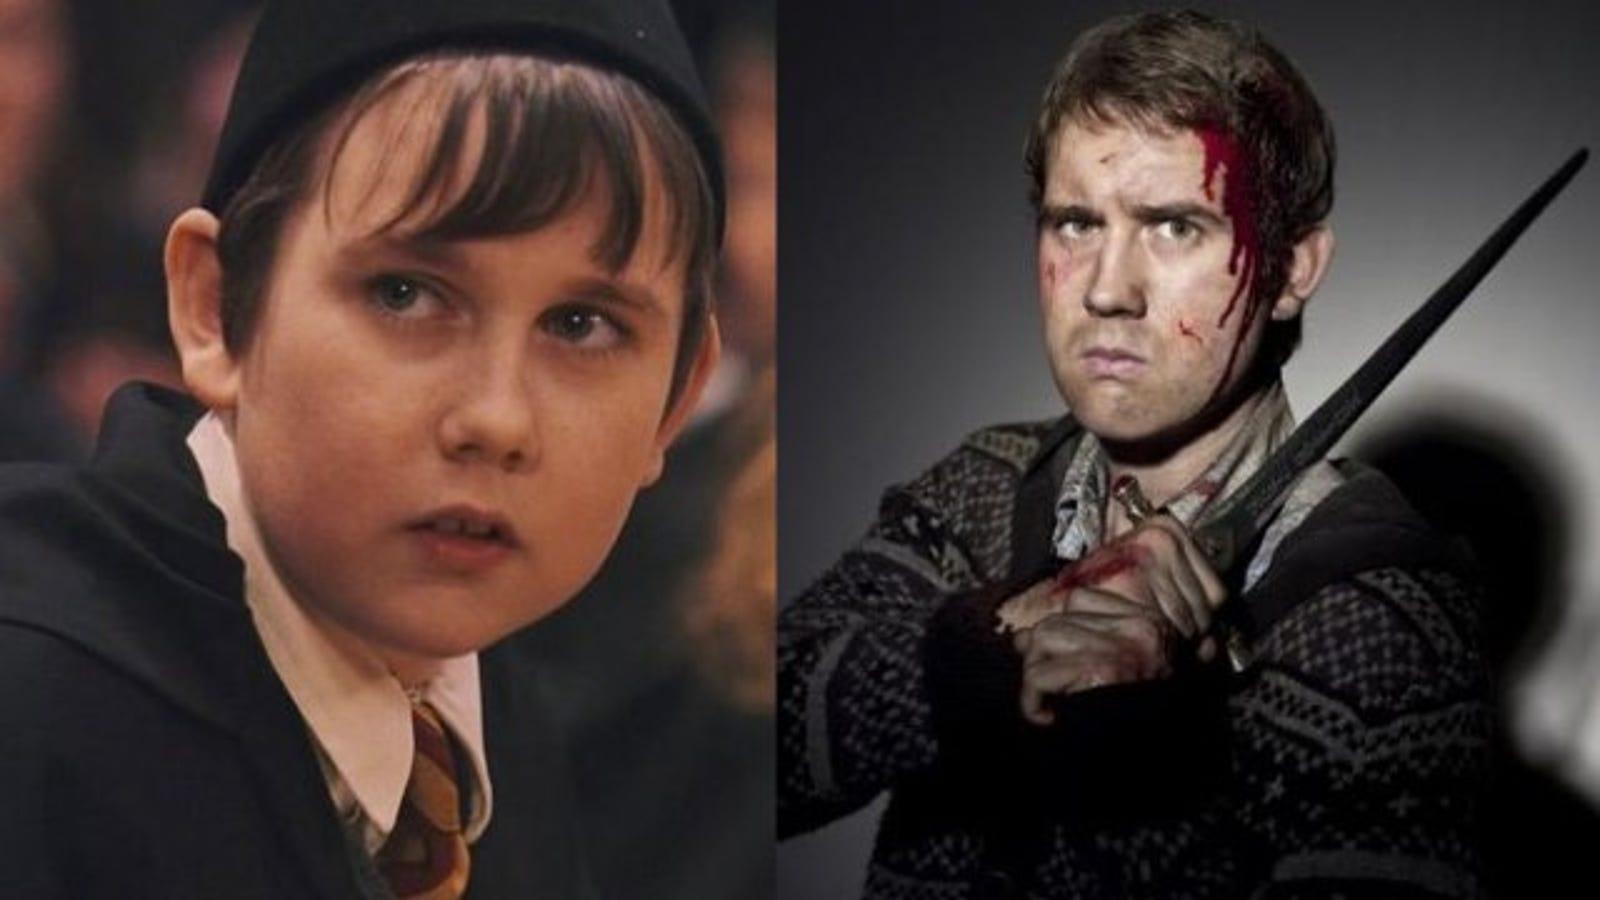 Neville Longbottom, the real hero of the Harry Potter franchise